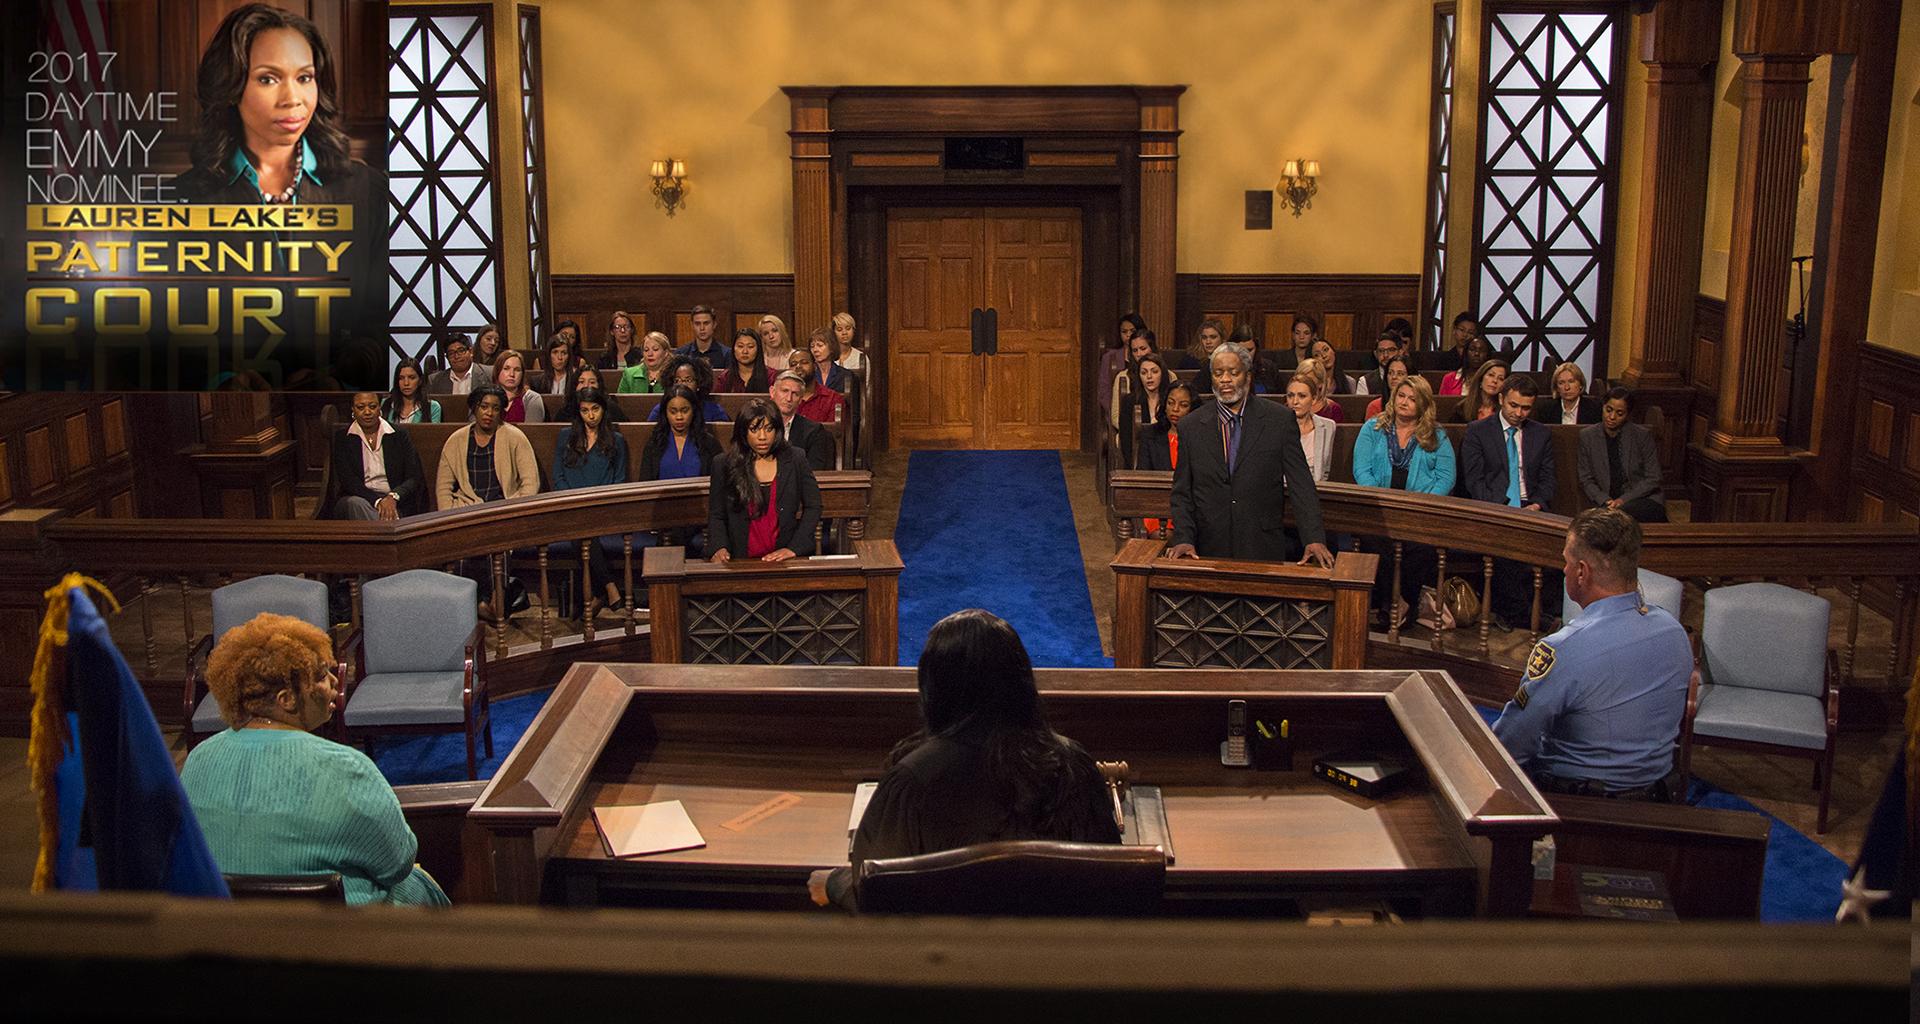 Paternity Court 1 Large.jpg